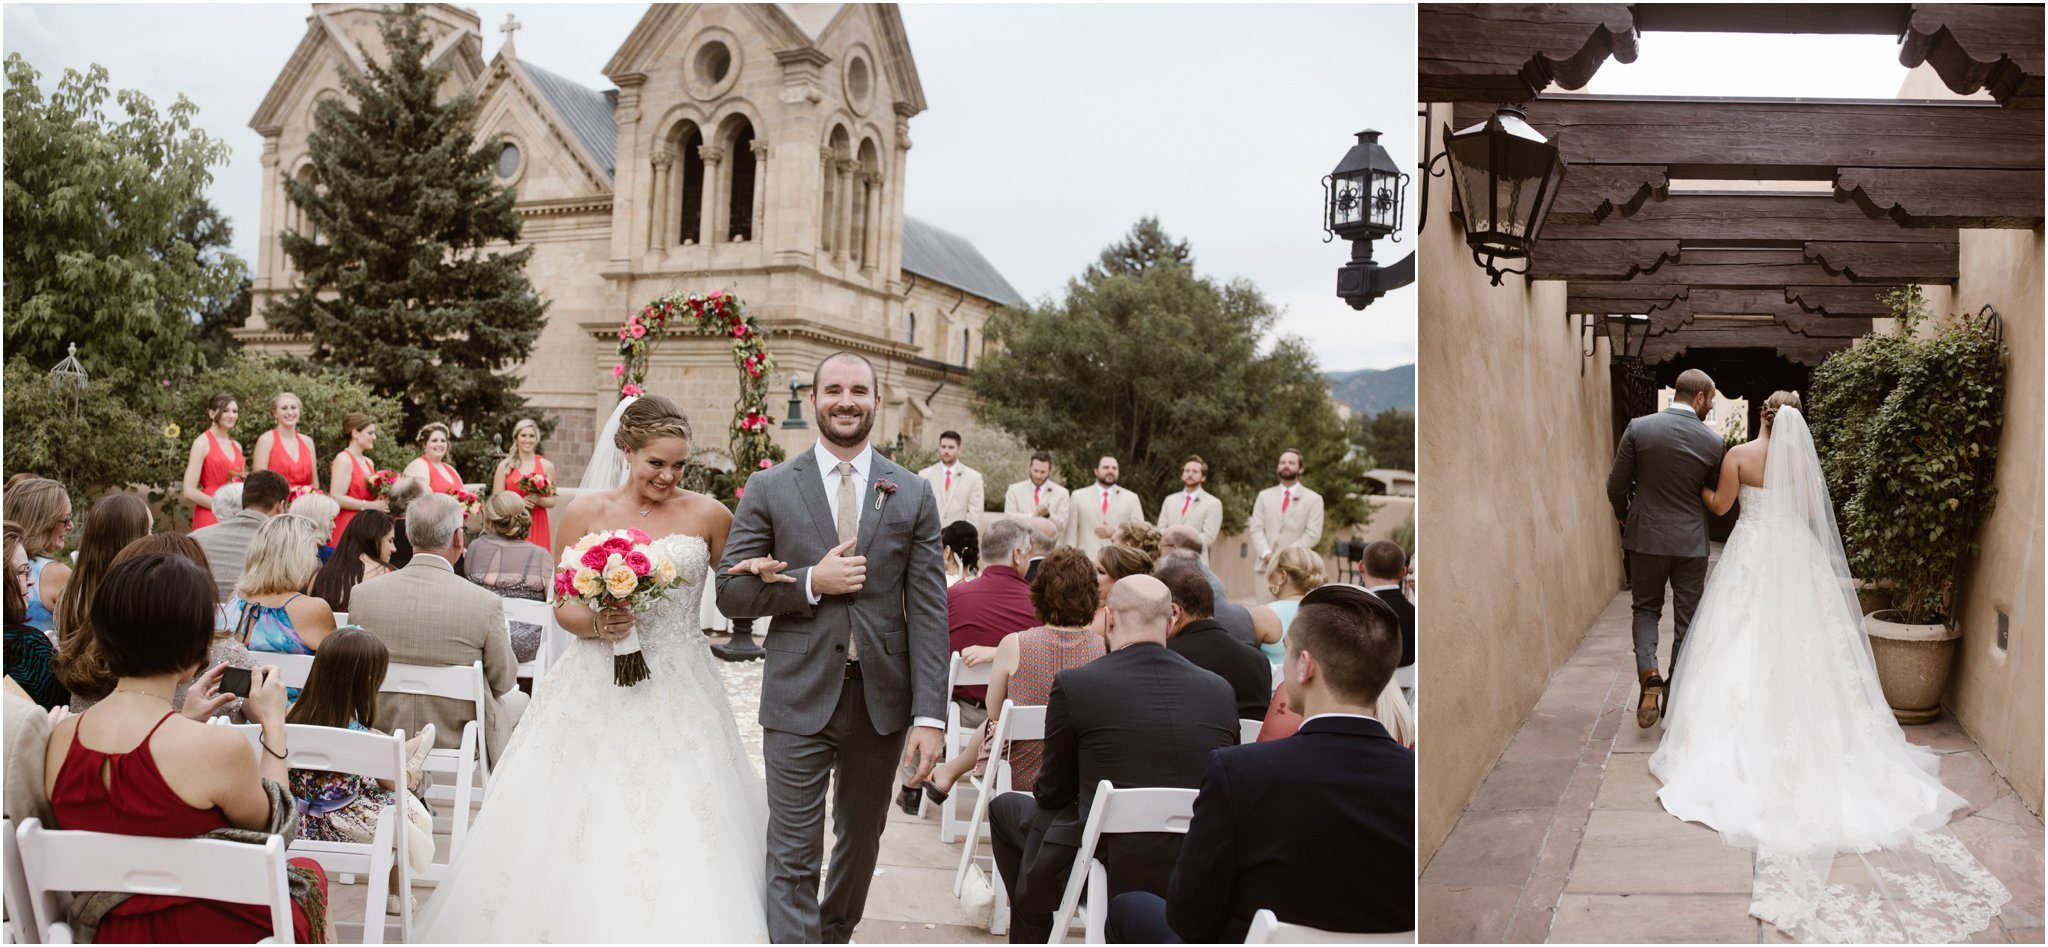 0049albuquerque-wedding-photographer_-santa-fe-wedding-photographer_-southwest-wedding-photography_-blue-rose-studio